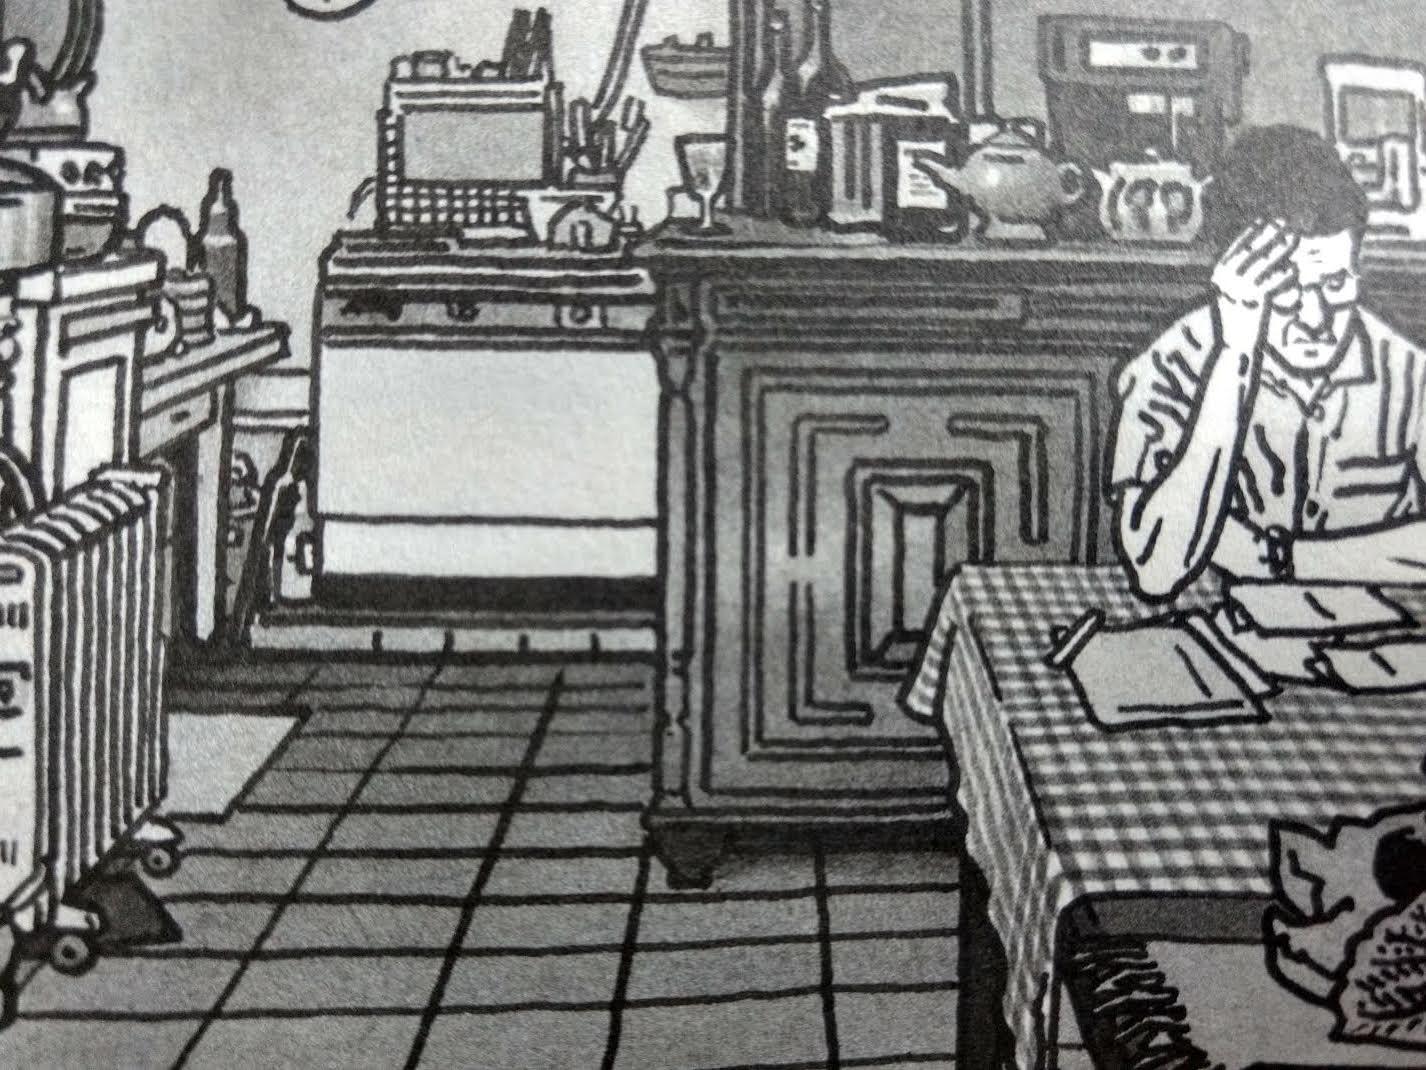 Alan's War, Graphic Novel Explorers Club